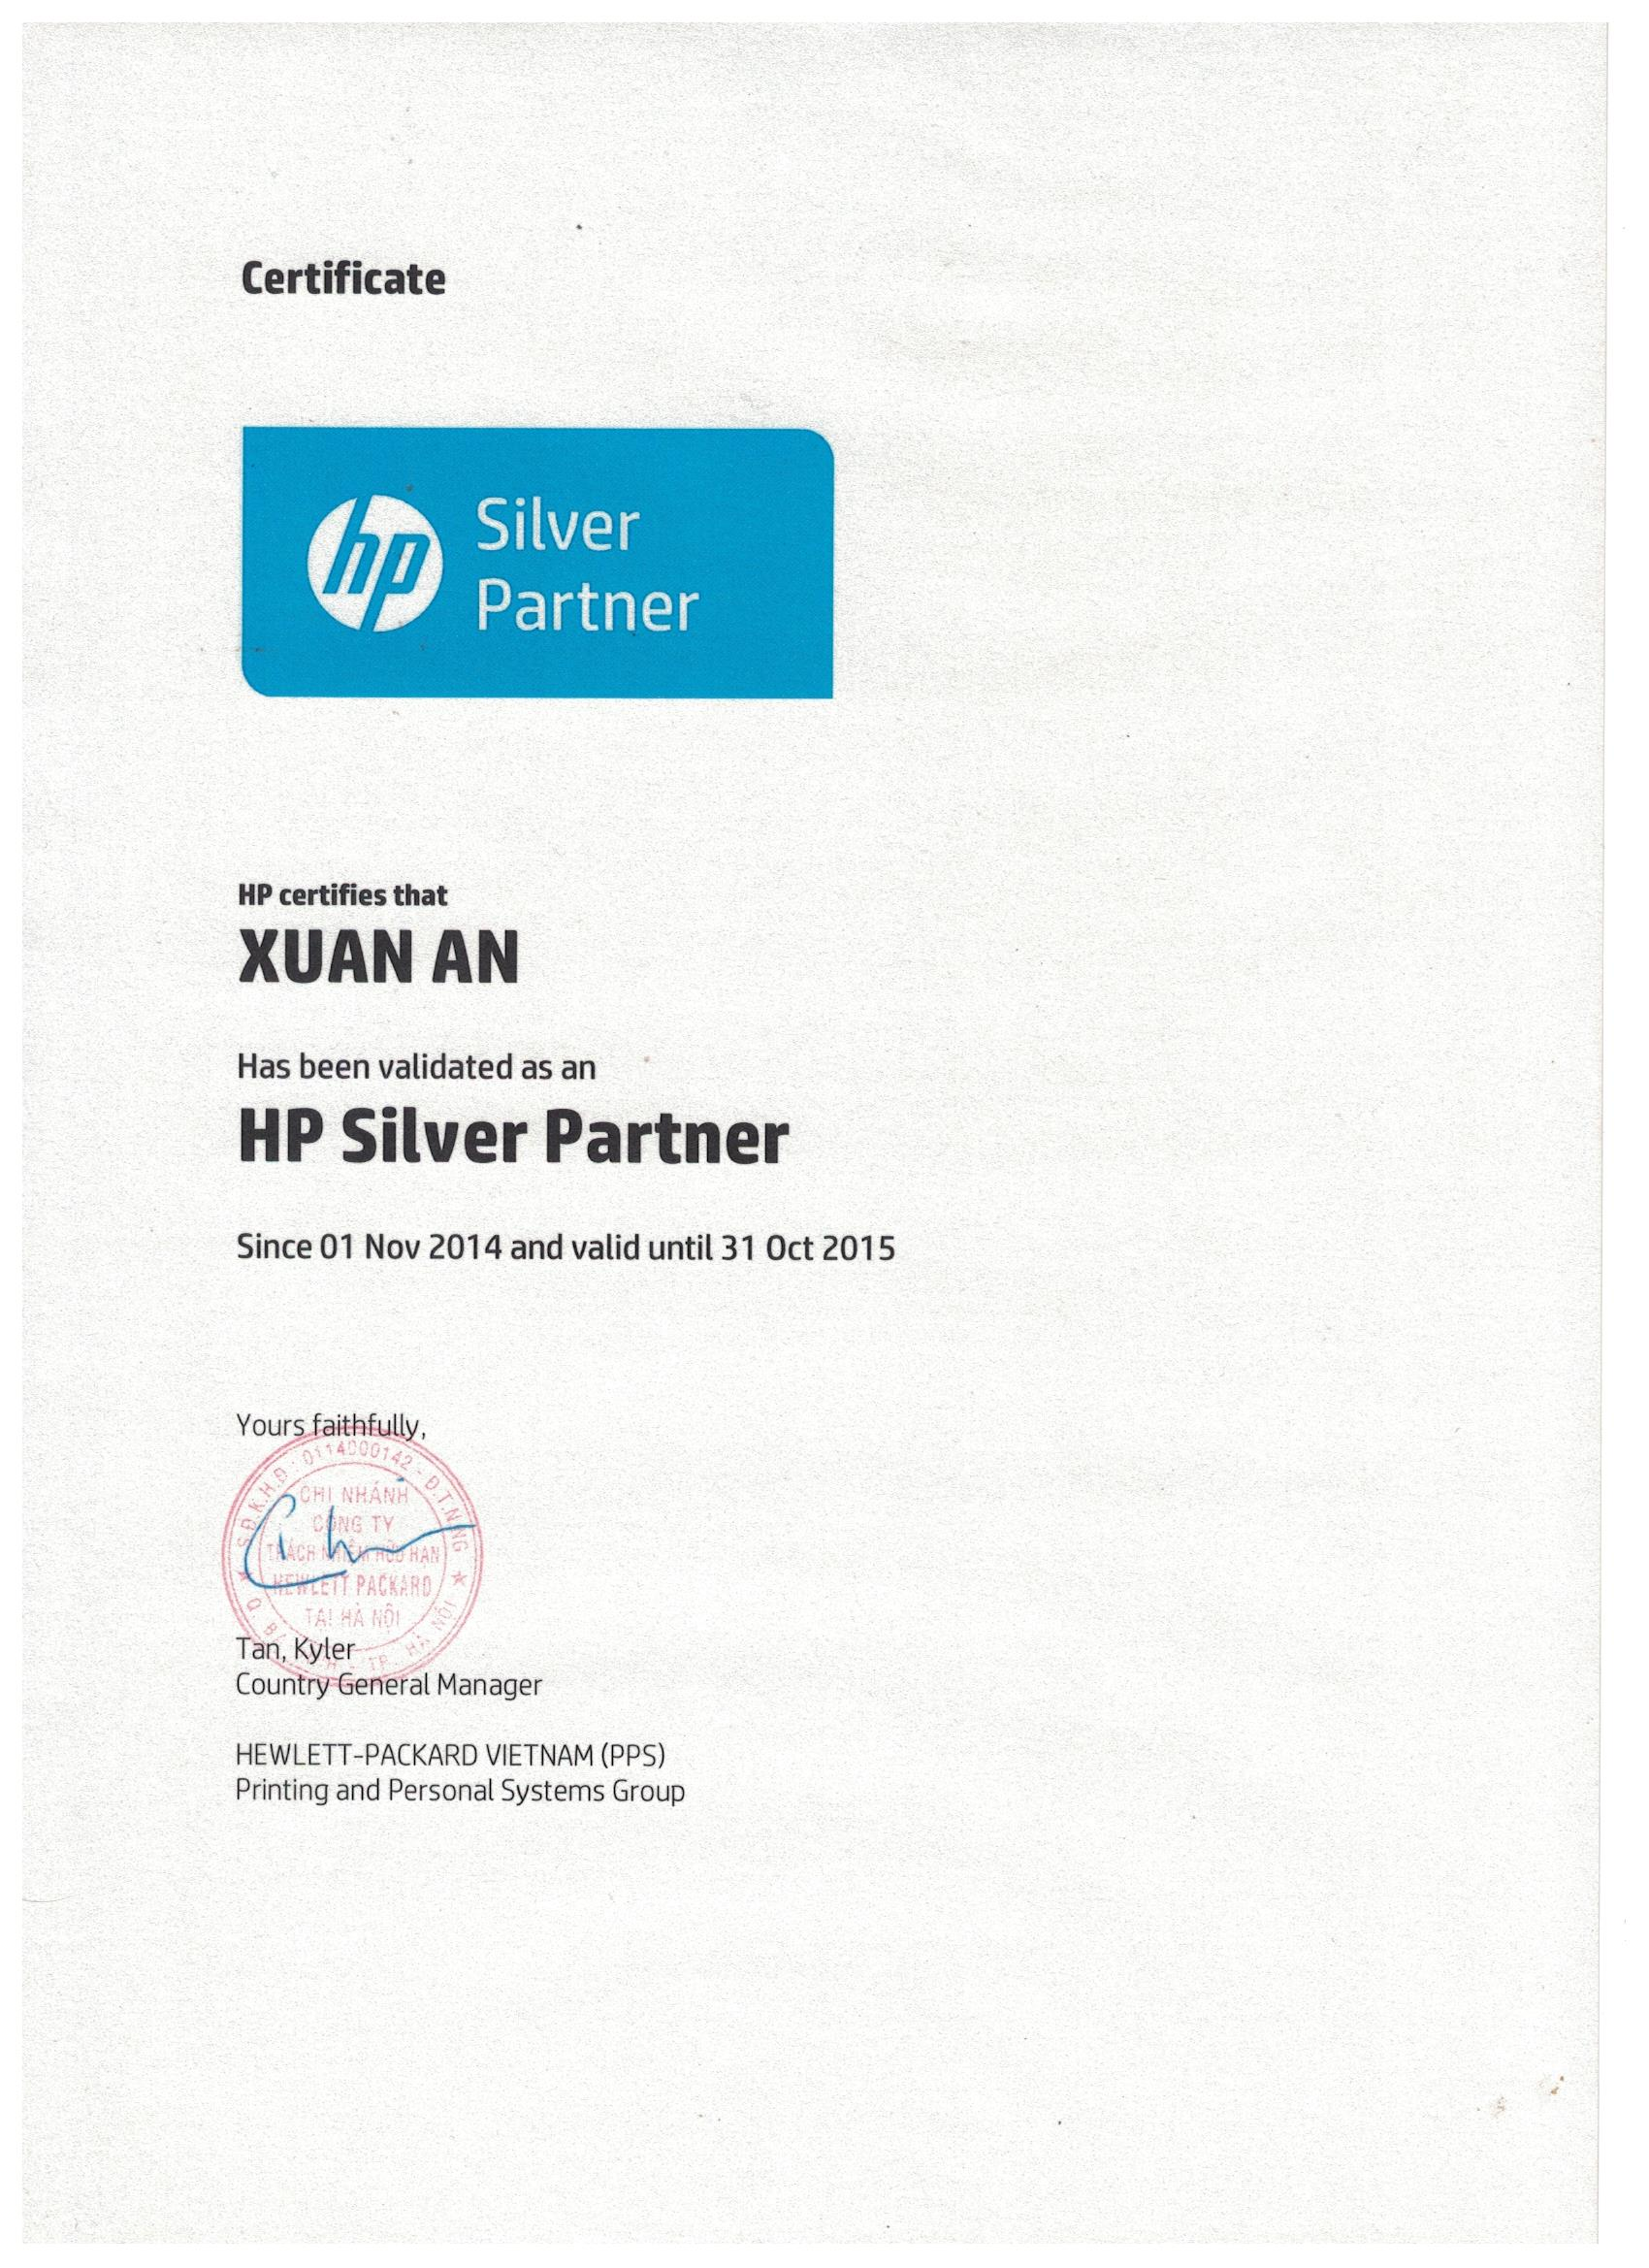 HP Probook 430 G6 - 6JG02PA (Silver)